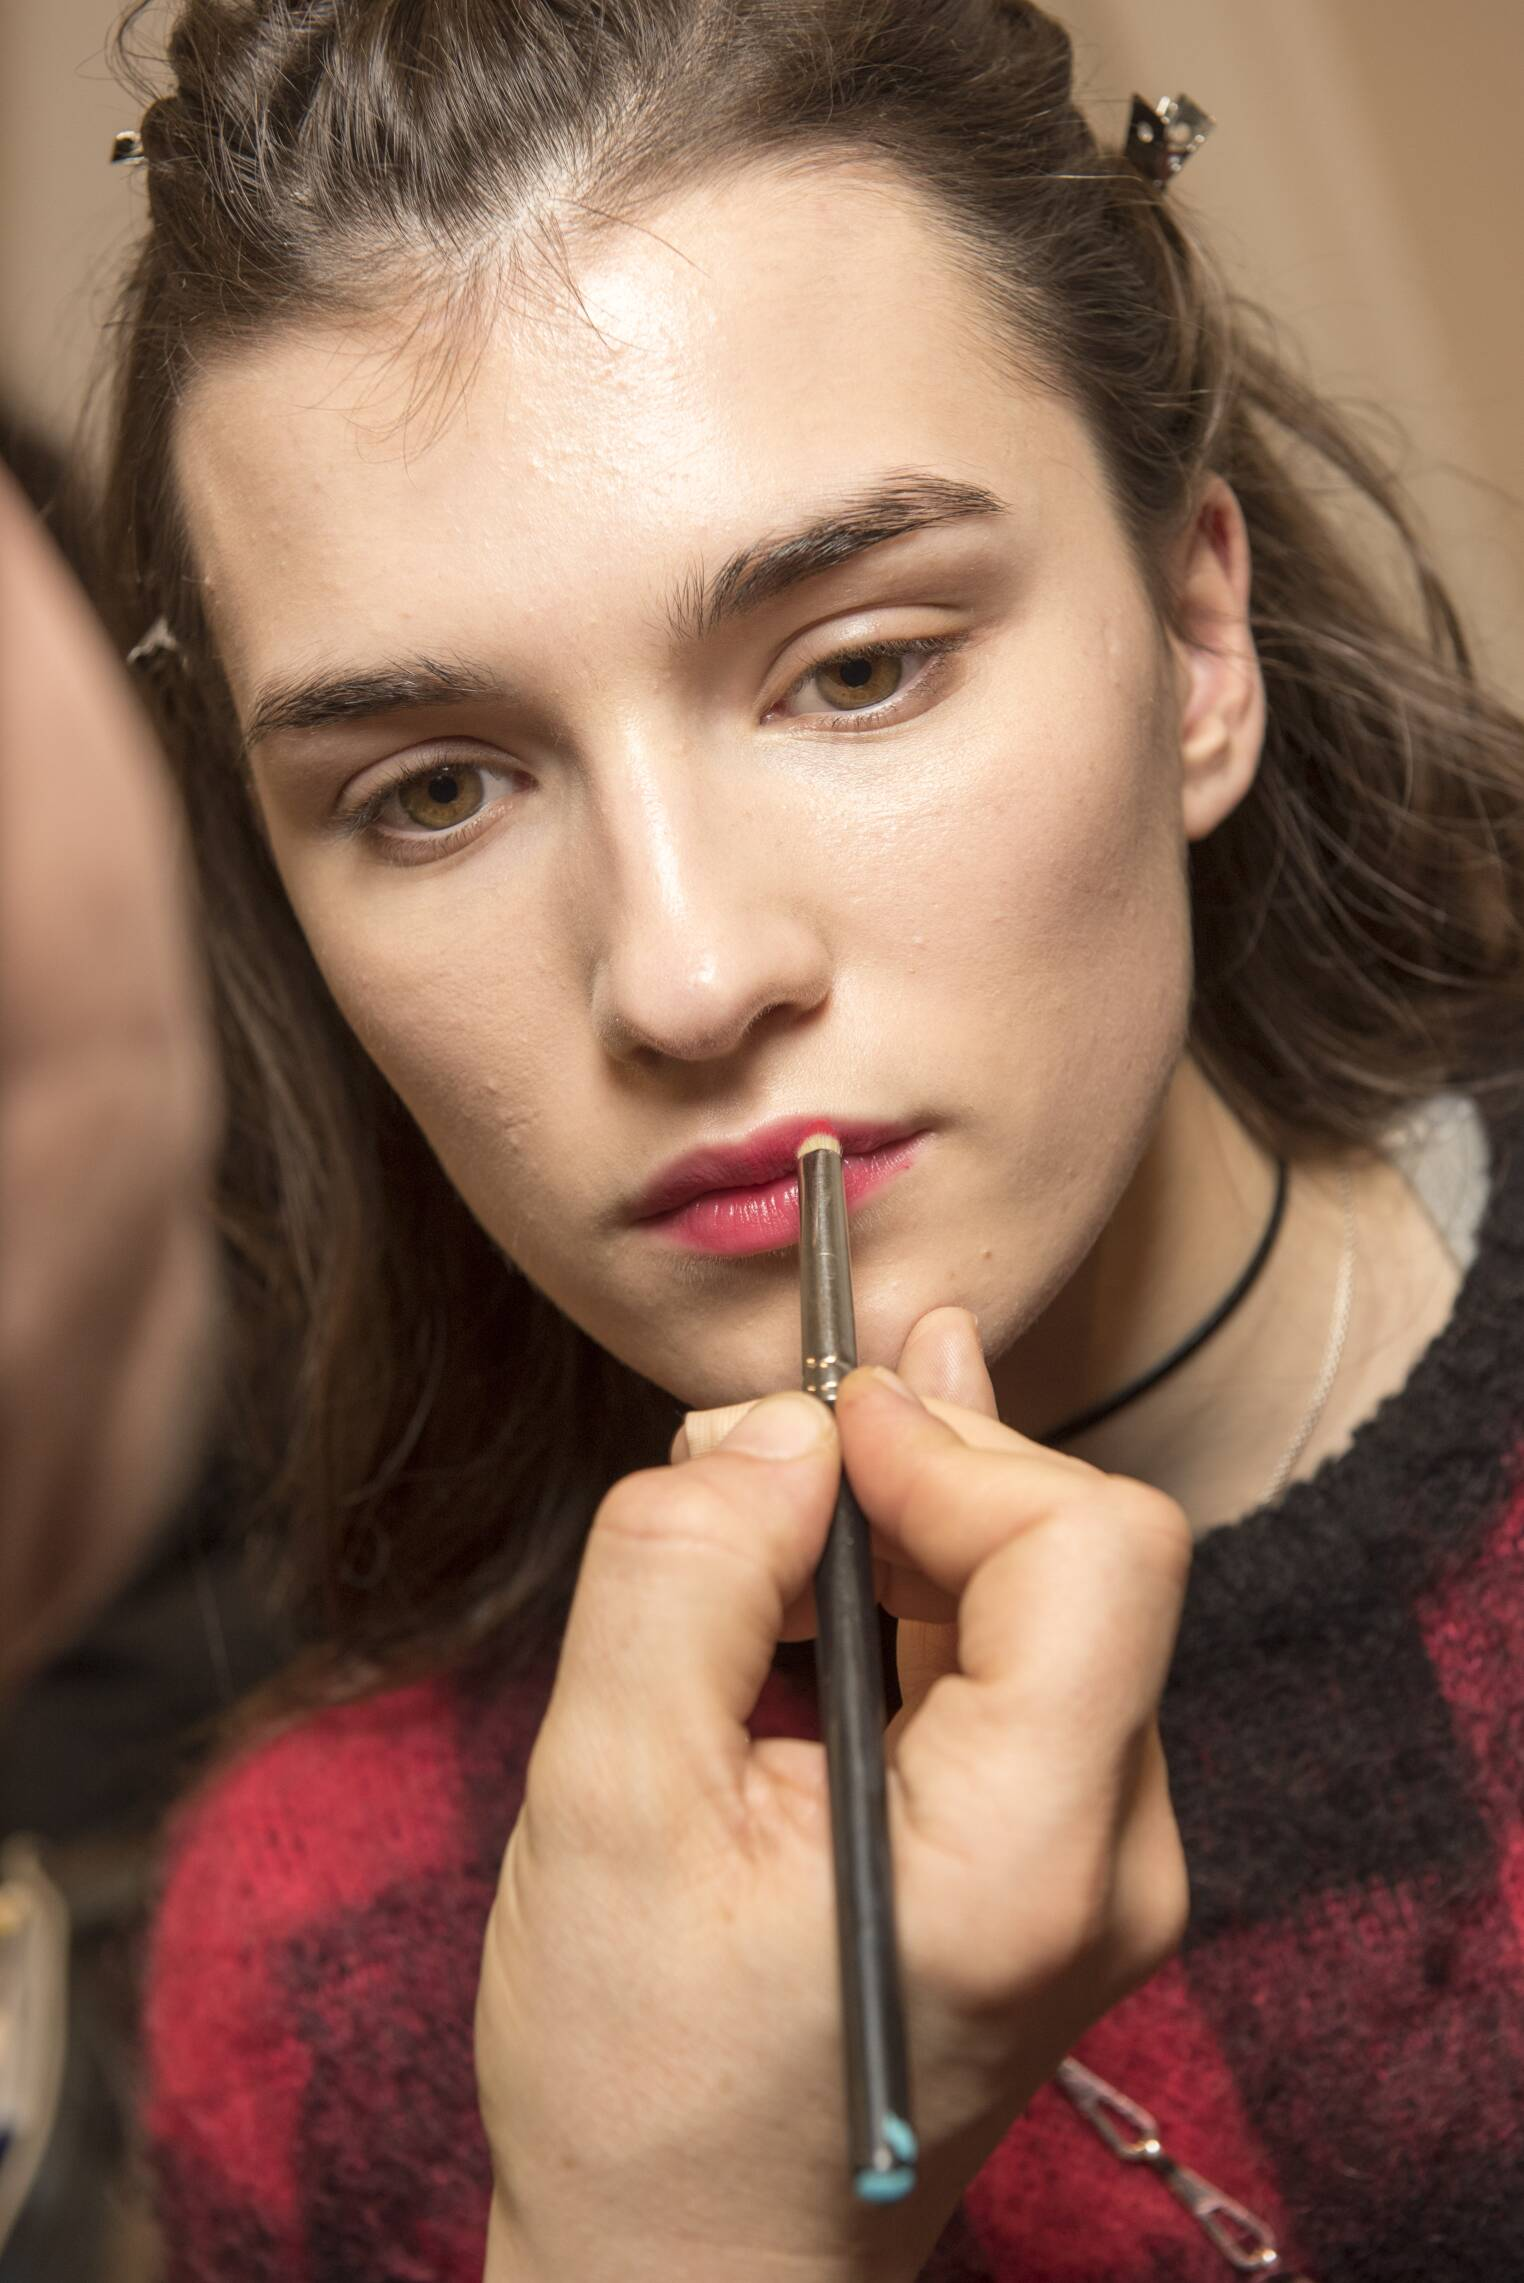 Backstage Alberta Ferretti Make Up 2017 Woman